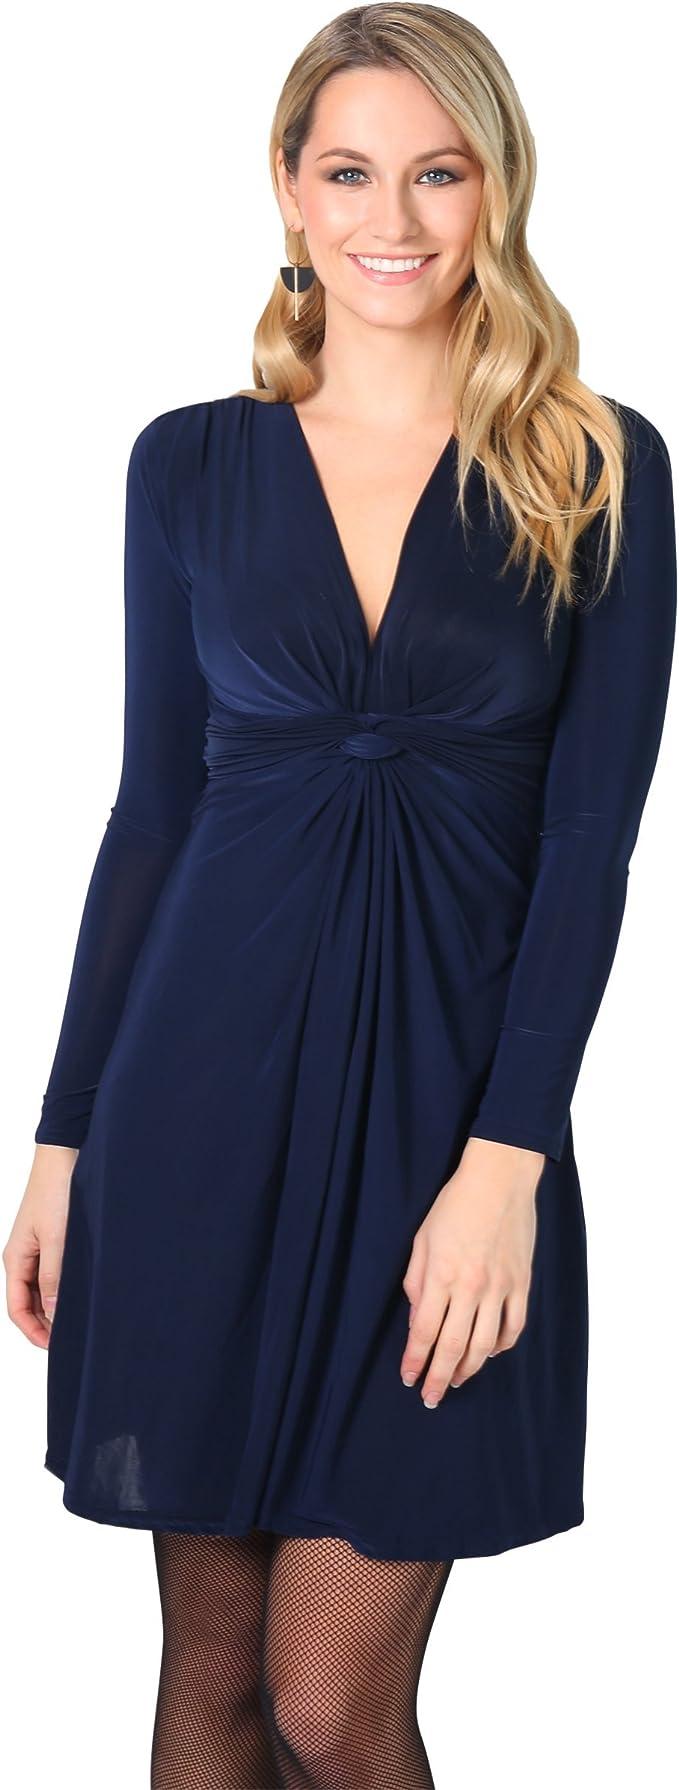 TALLA 48. KRISP Chaqueta Mujer Fiesta Punto Encaje Blazer Elegante Cardigan Azul Marino (9878) 48